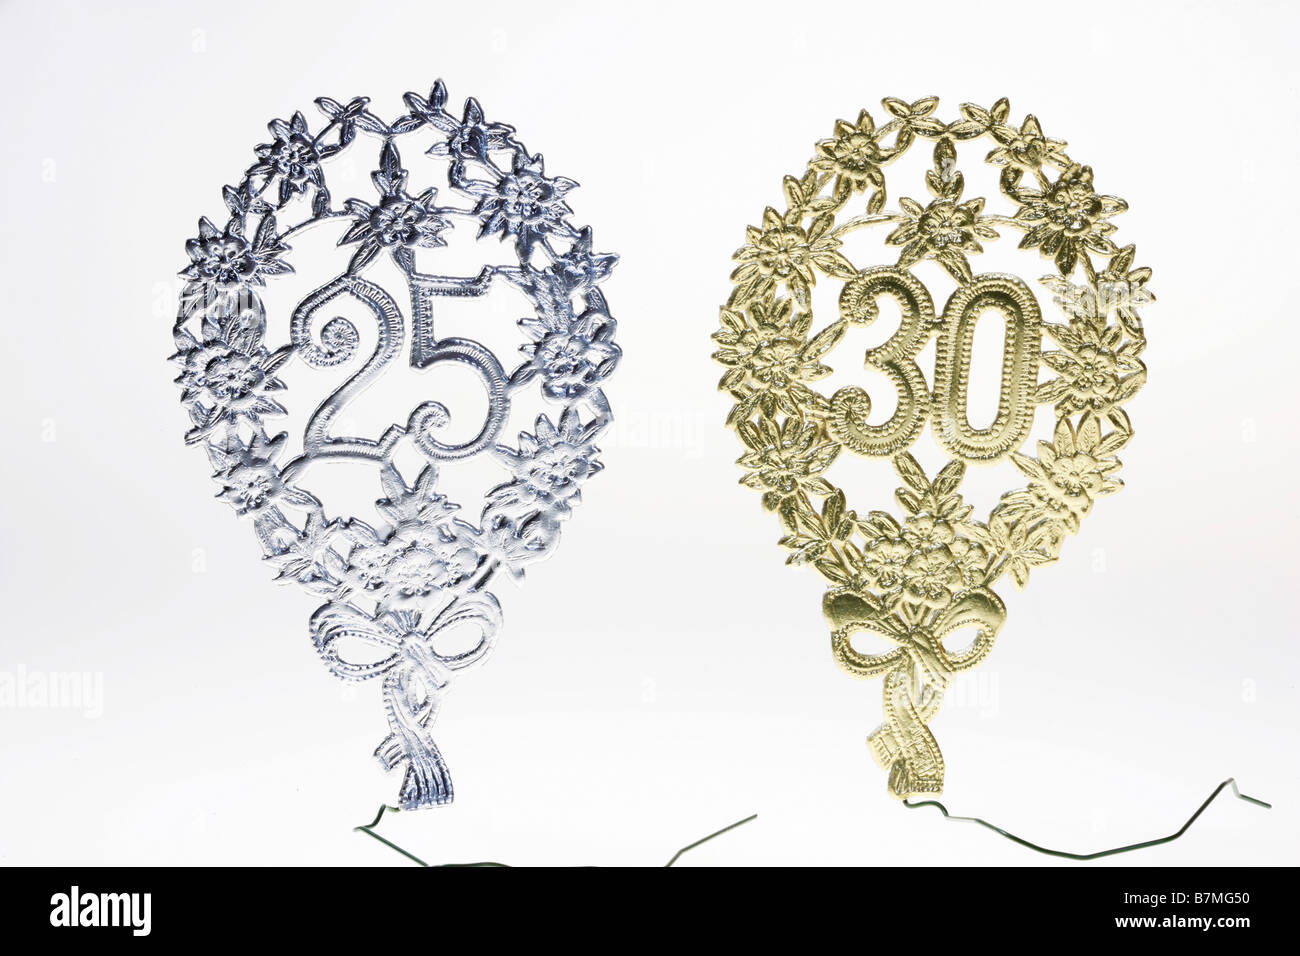 Decoration for wedding anniversary - Stock Image